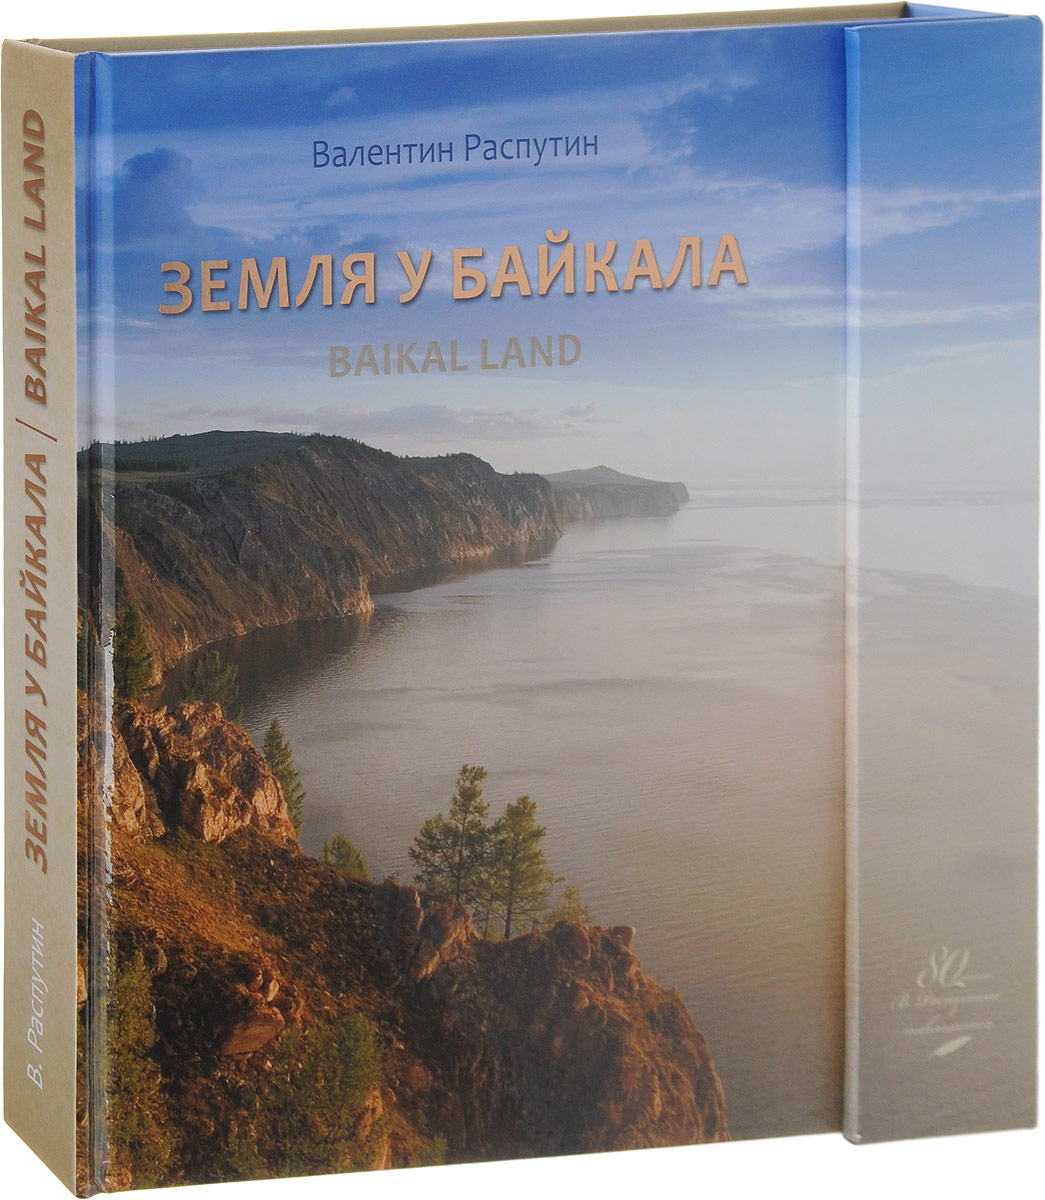 алентин Распутин Земля у байкала / Baikal Land